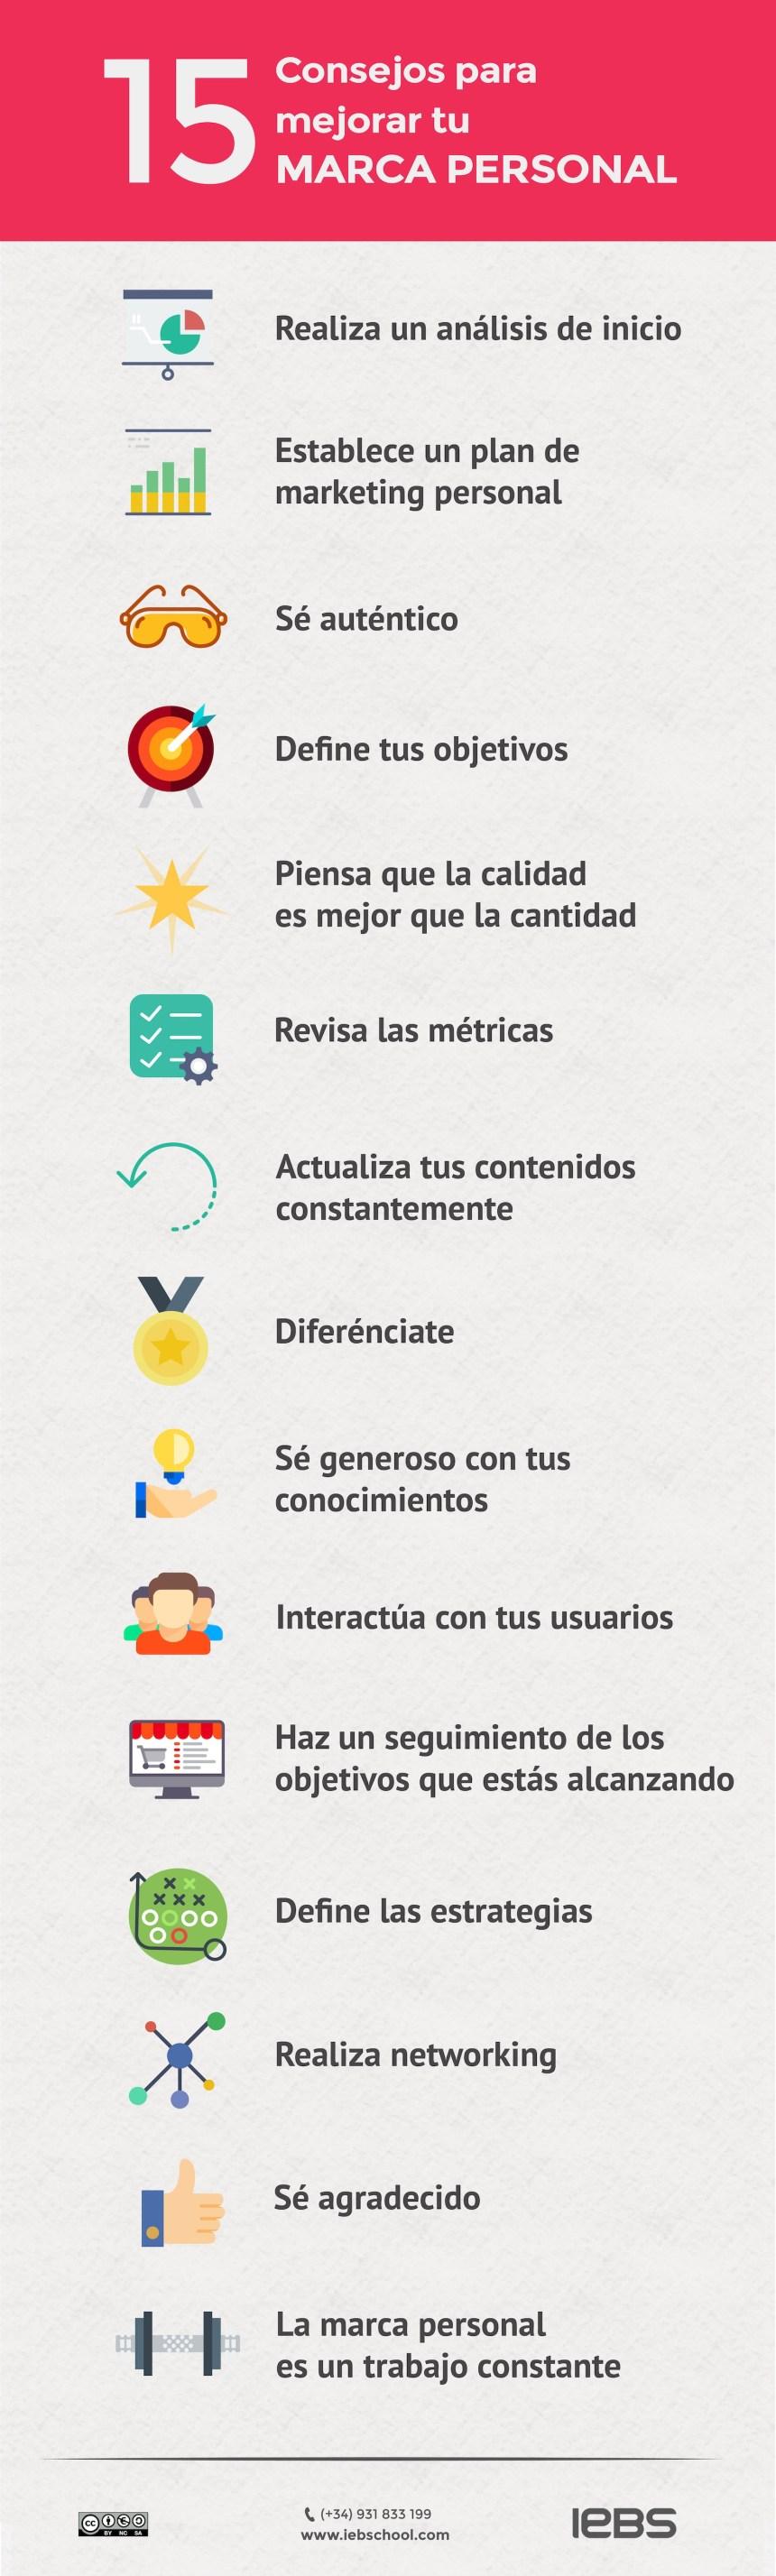 15 consejos para mejorar tu Marca Personal #infografia #marketing #marcapersonal